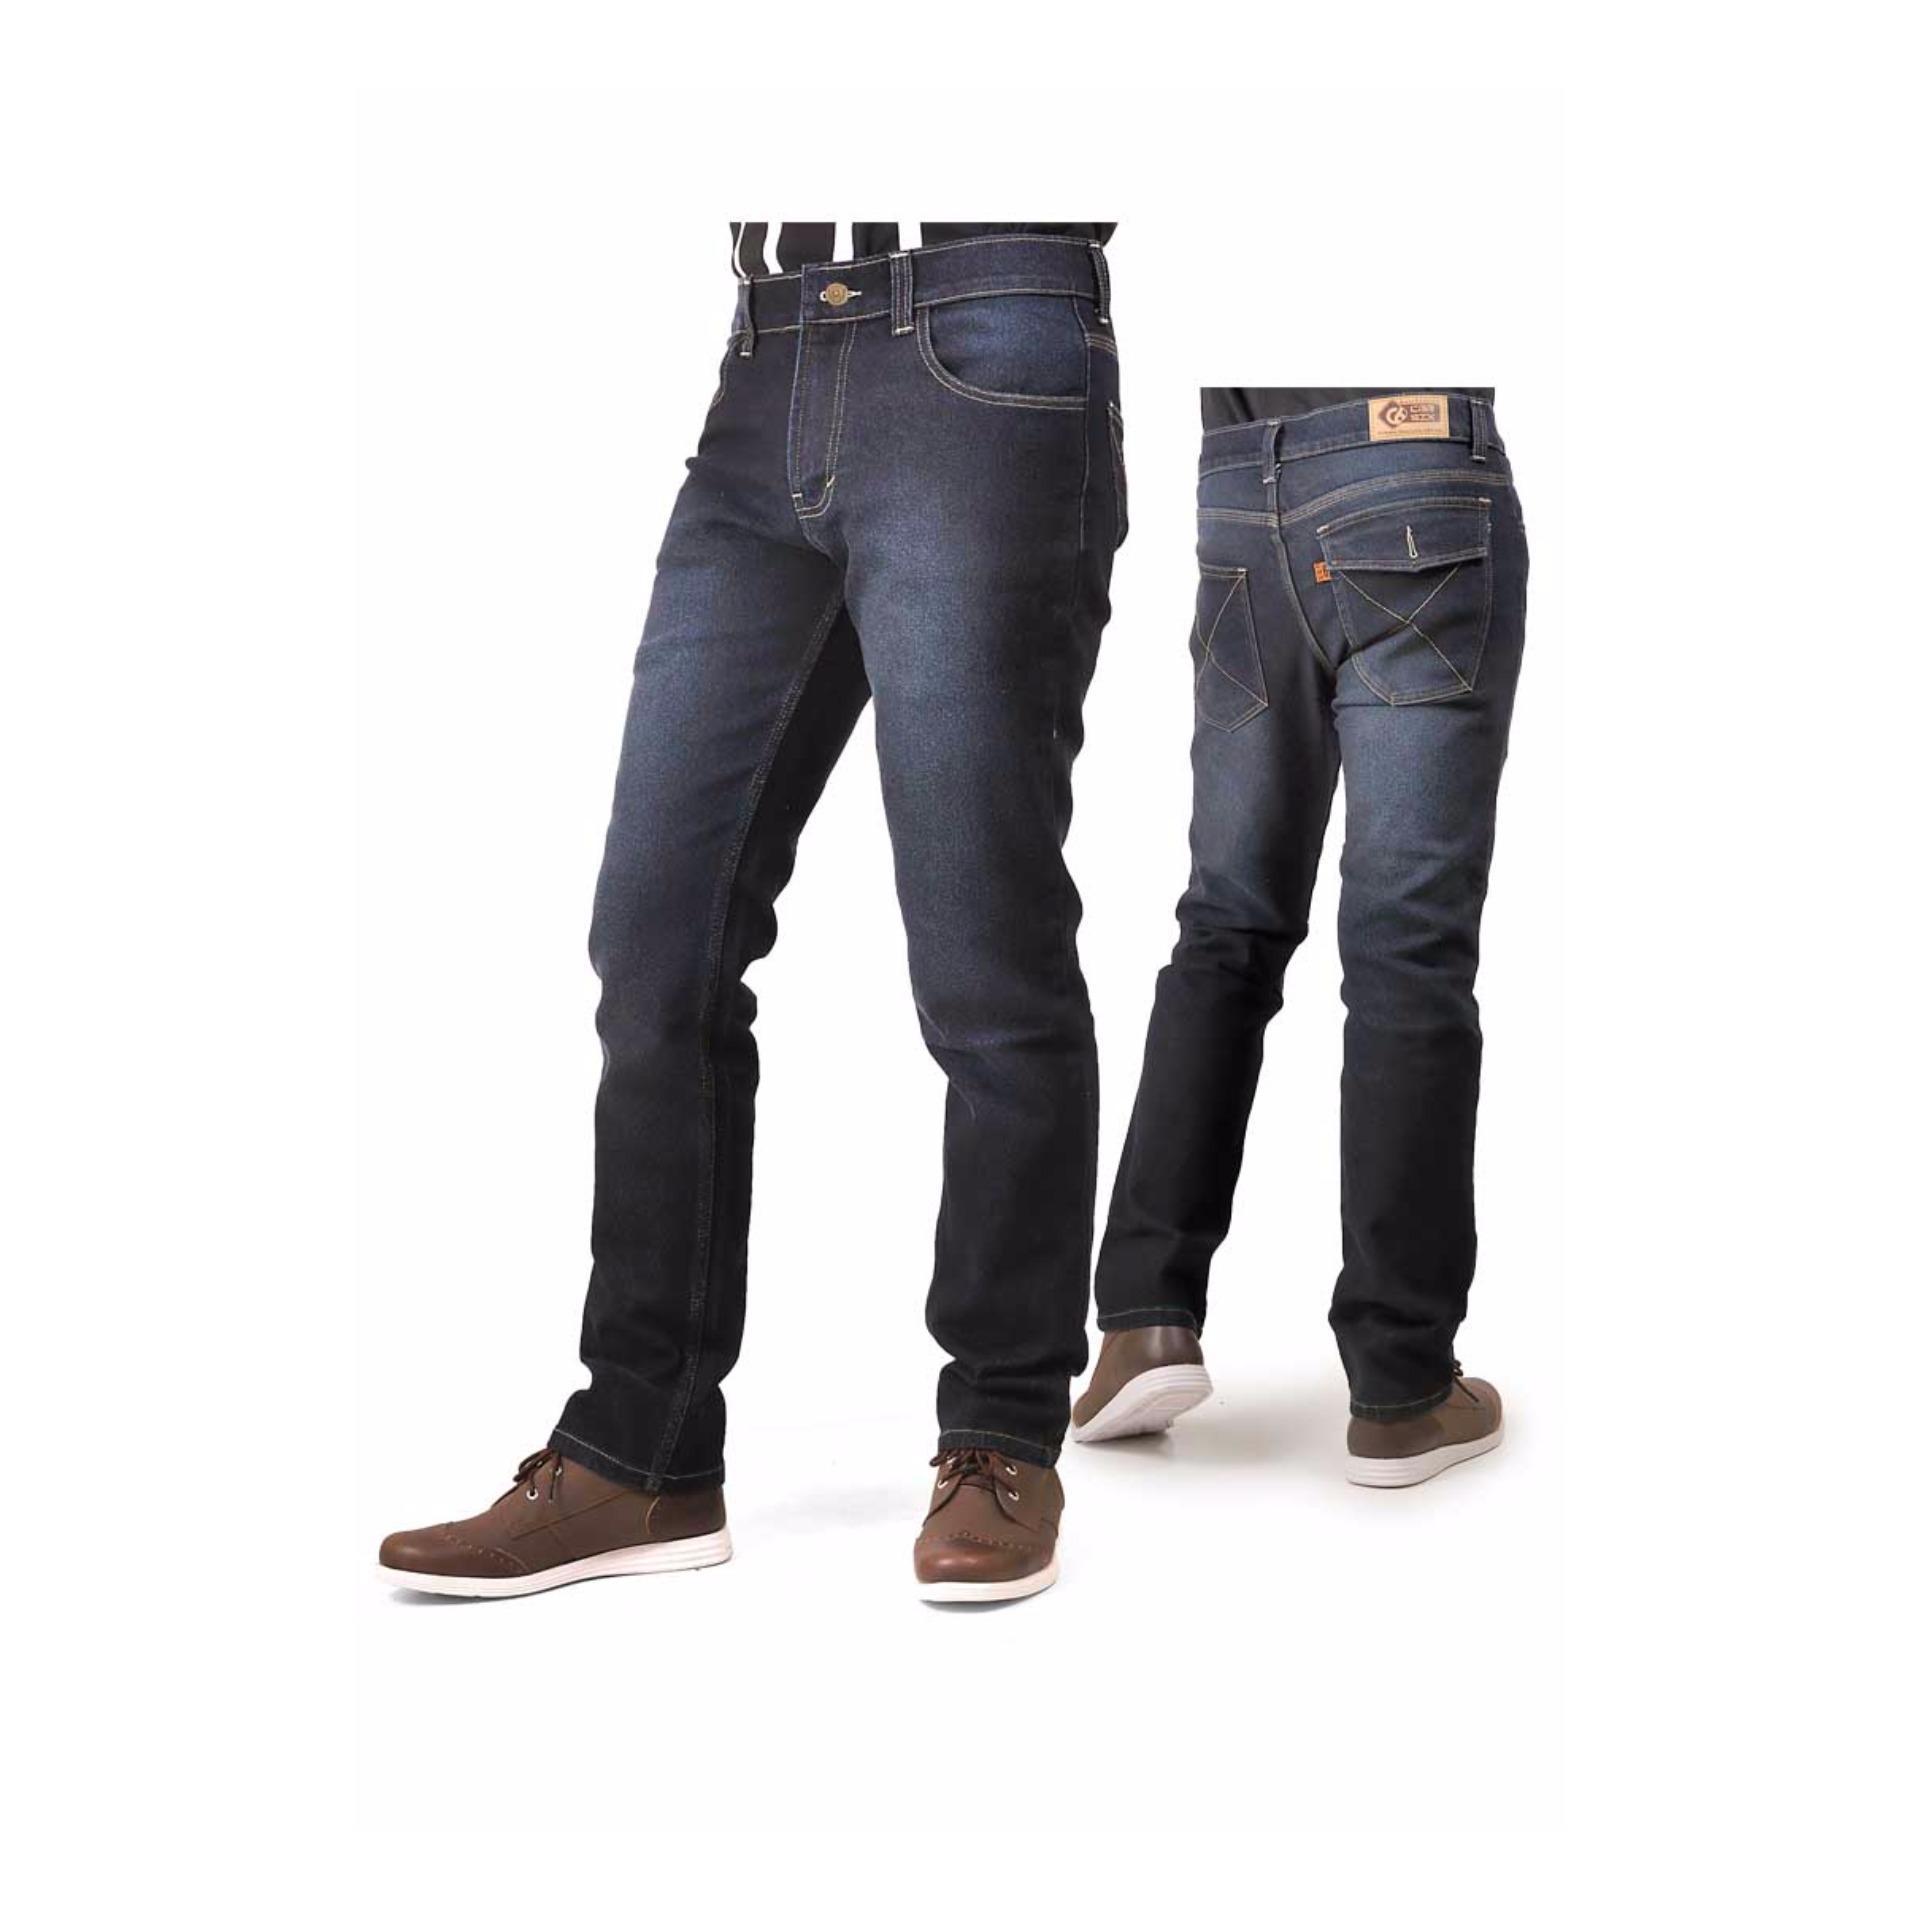 Lagenza New Arrival Men Celana Loreng Cargo Pants Distro Lgcb 292 Coup S4 Bermuda Pendek Pria Korean Brand Jeans 285